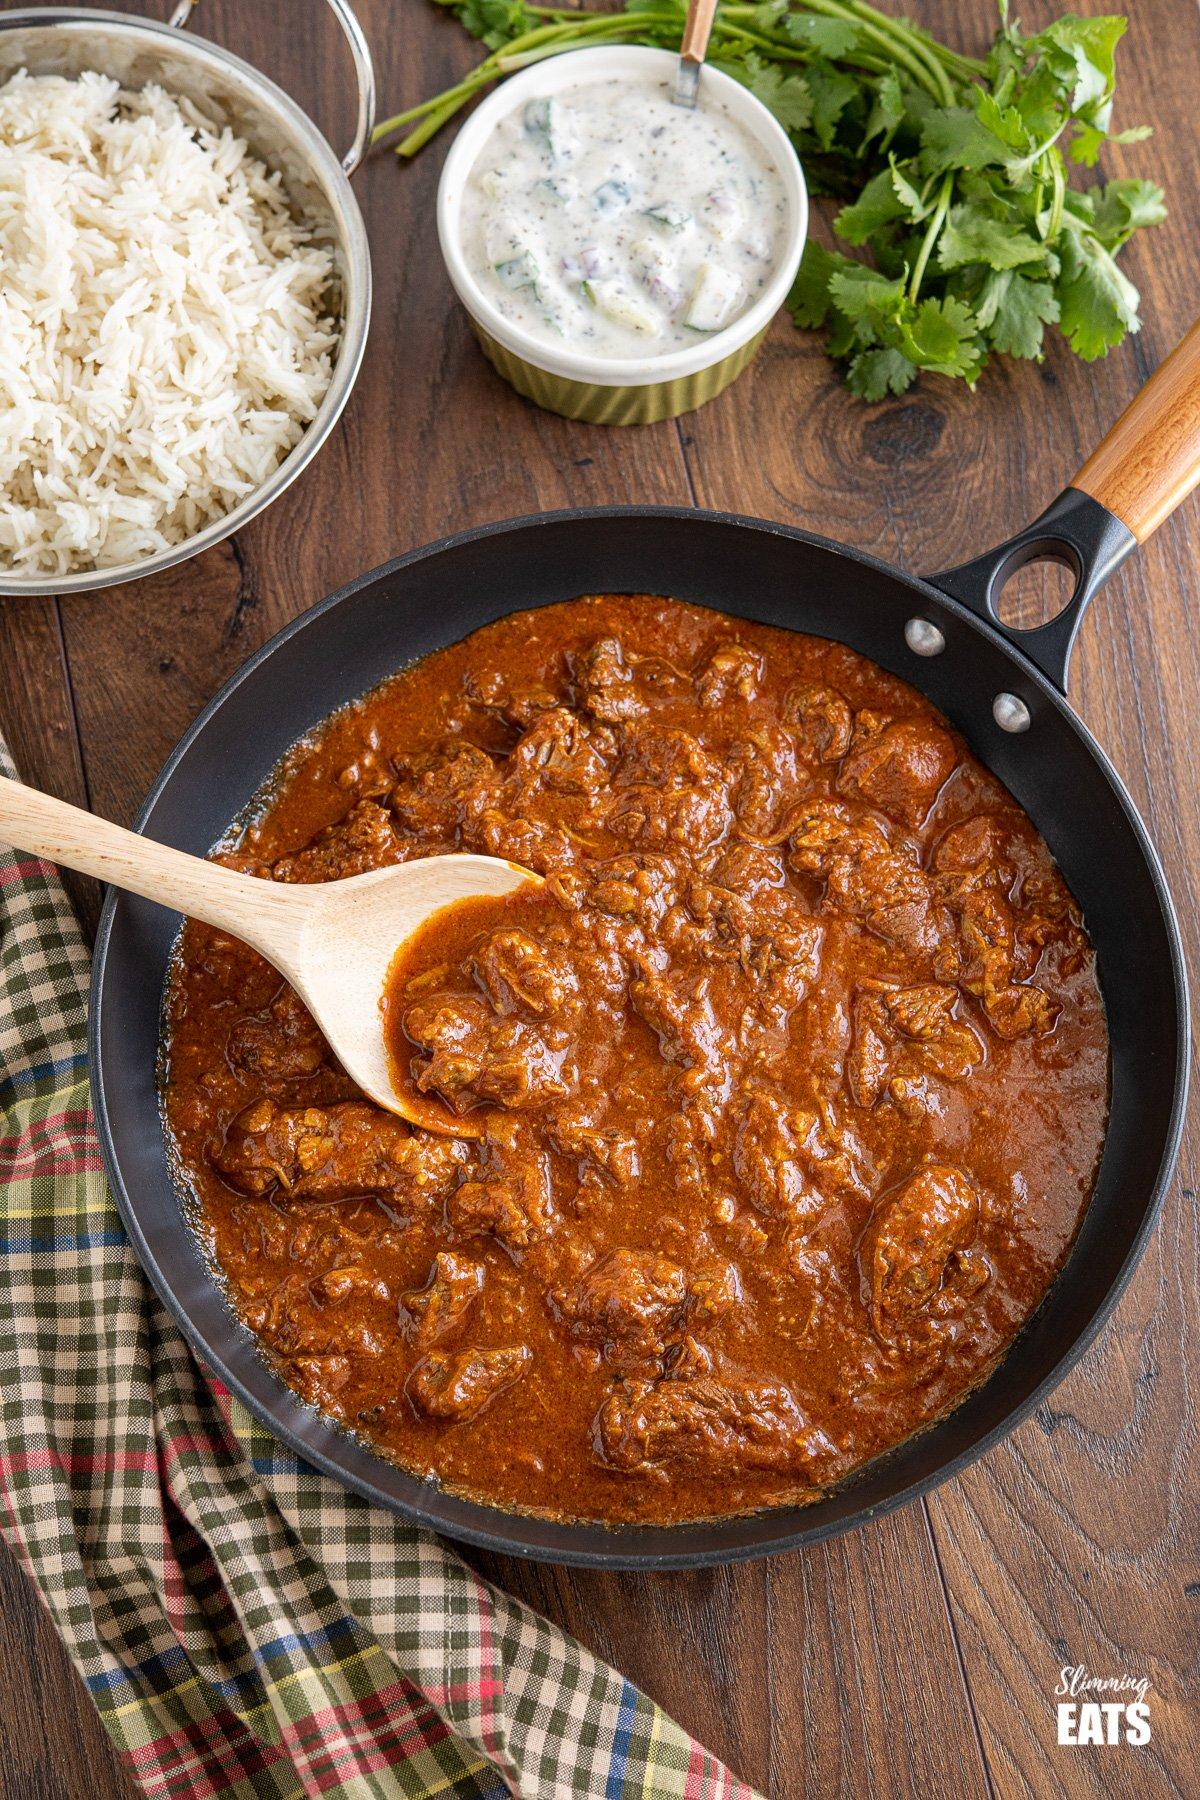 lamb rogan josh in black frying pan with wooden handle, rice, raita and cilantro in background